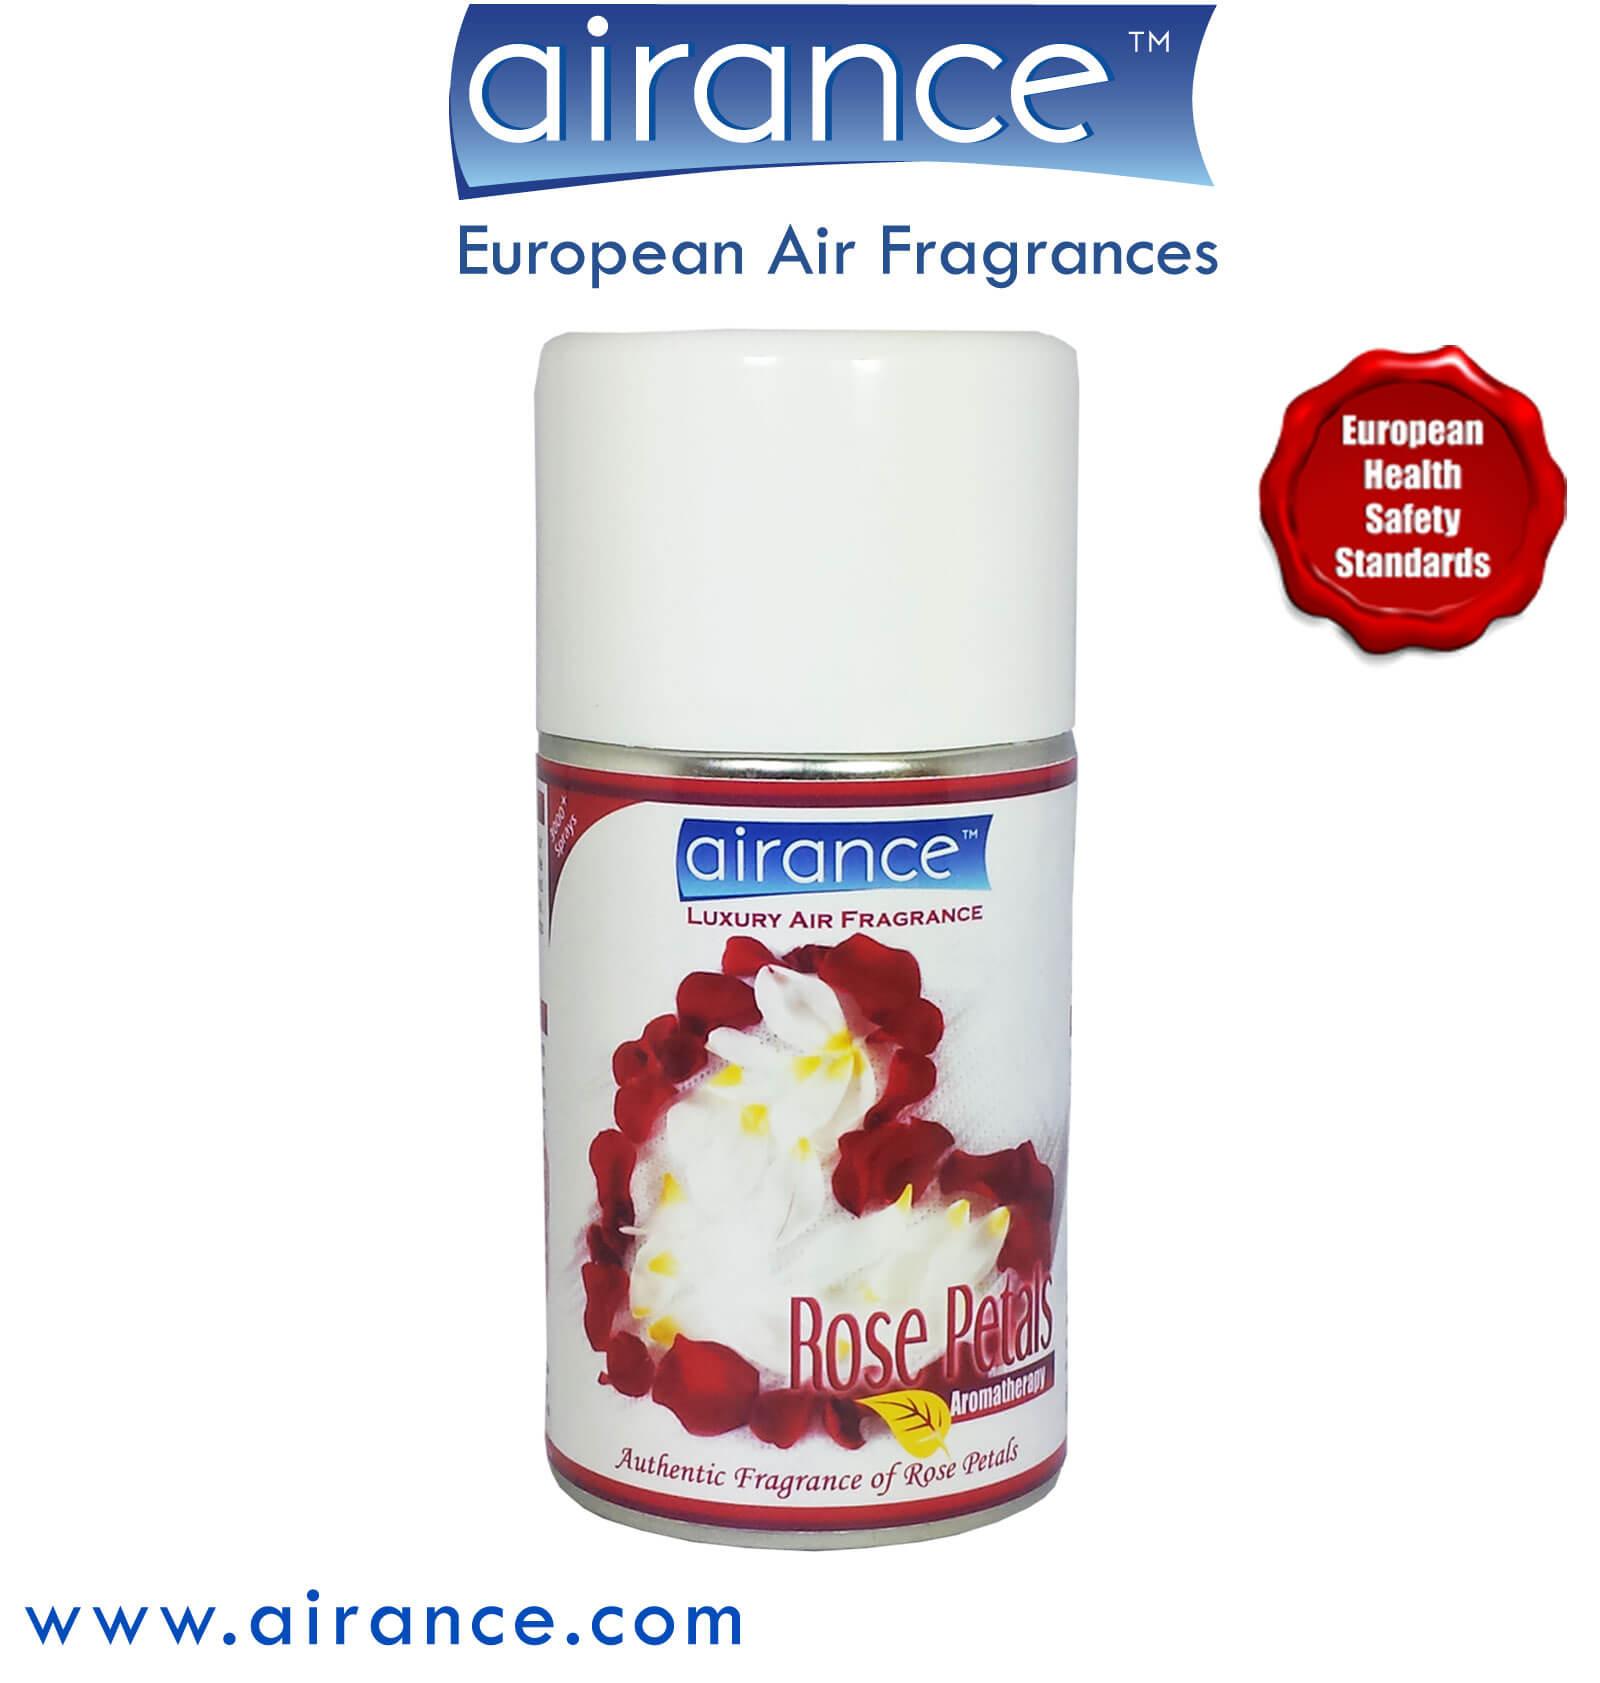 Airance